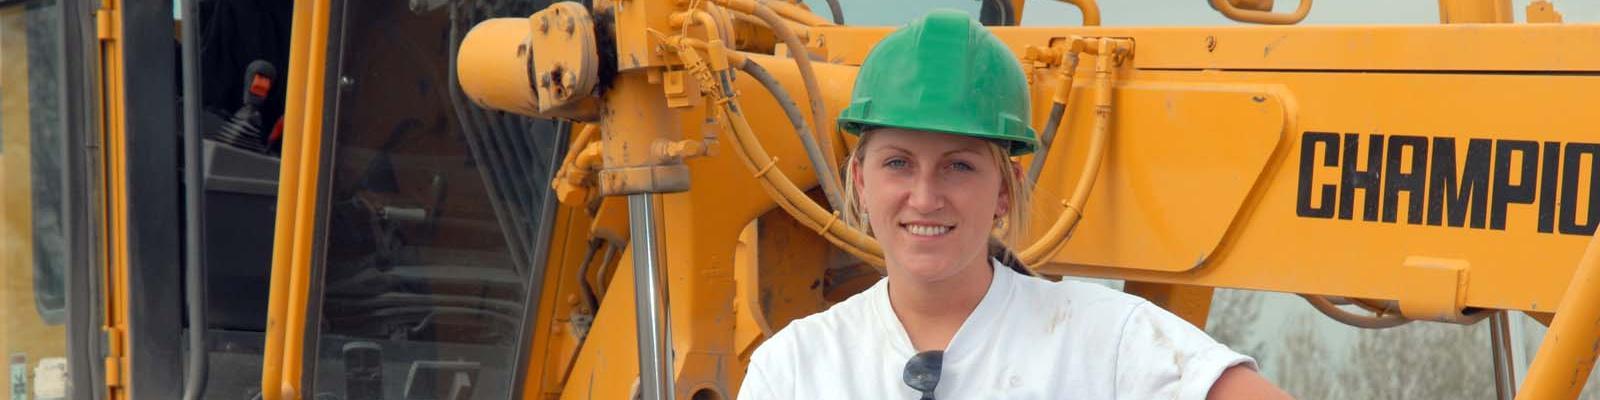 Woman heavy equipment operator construction worker